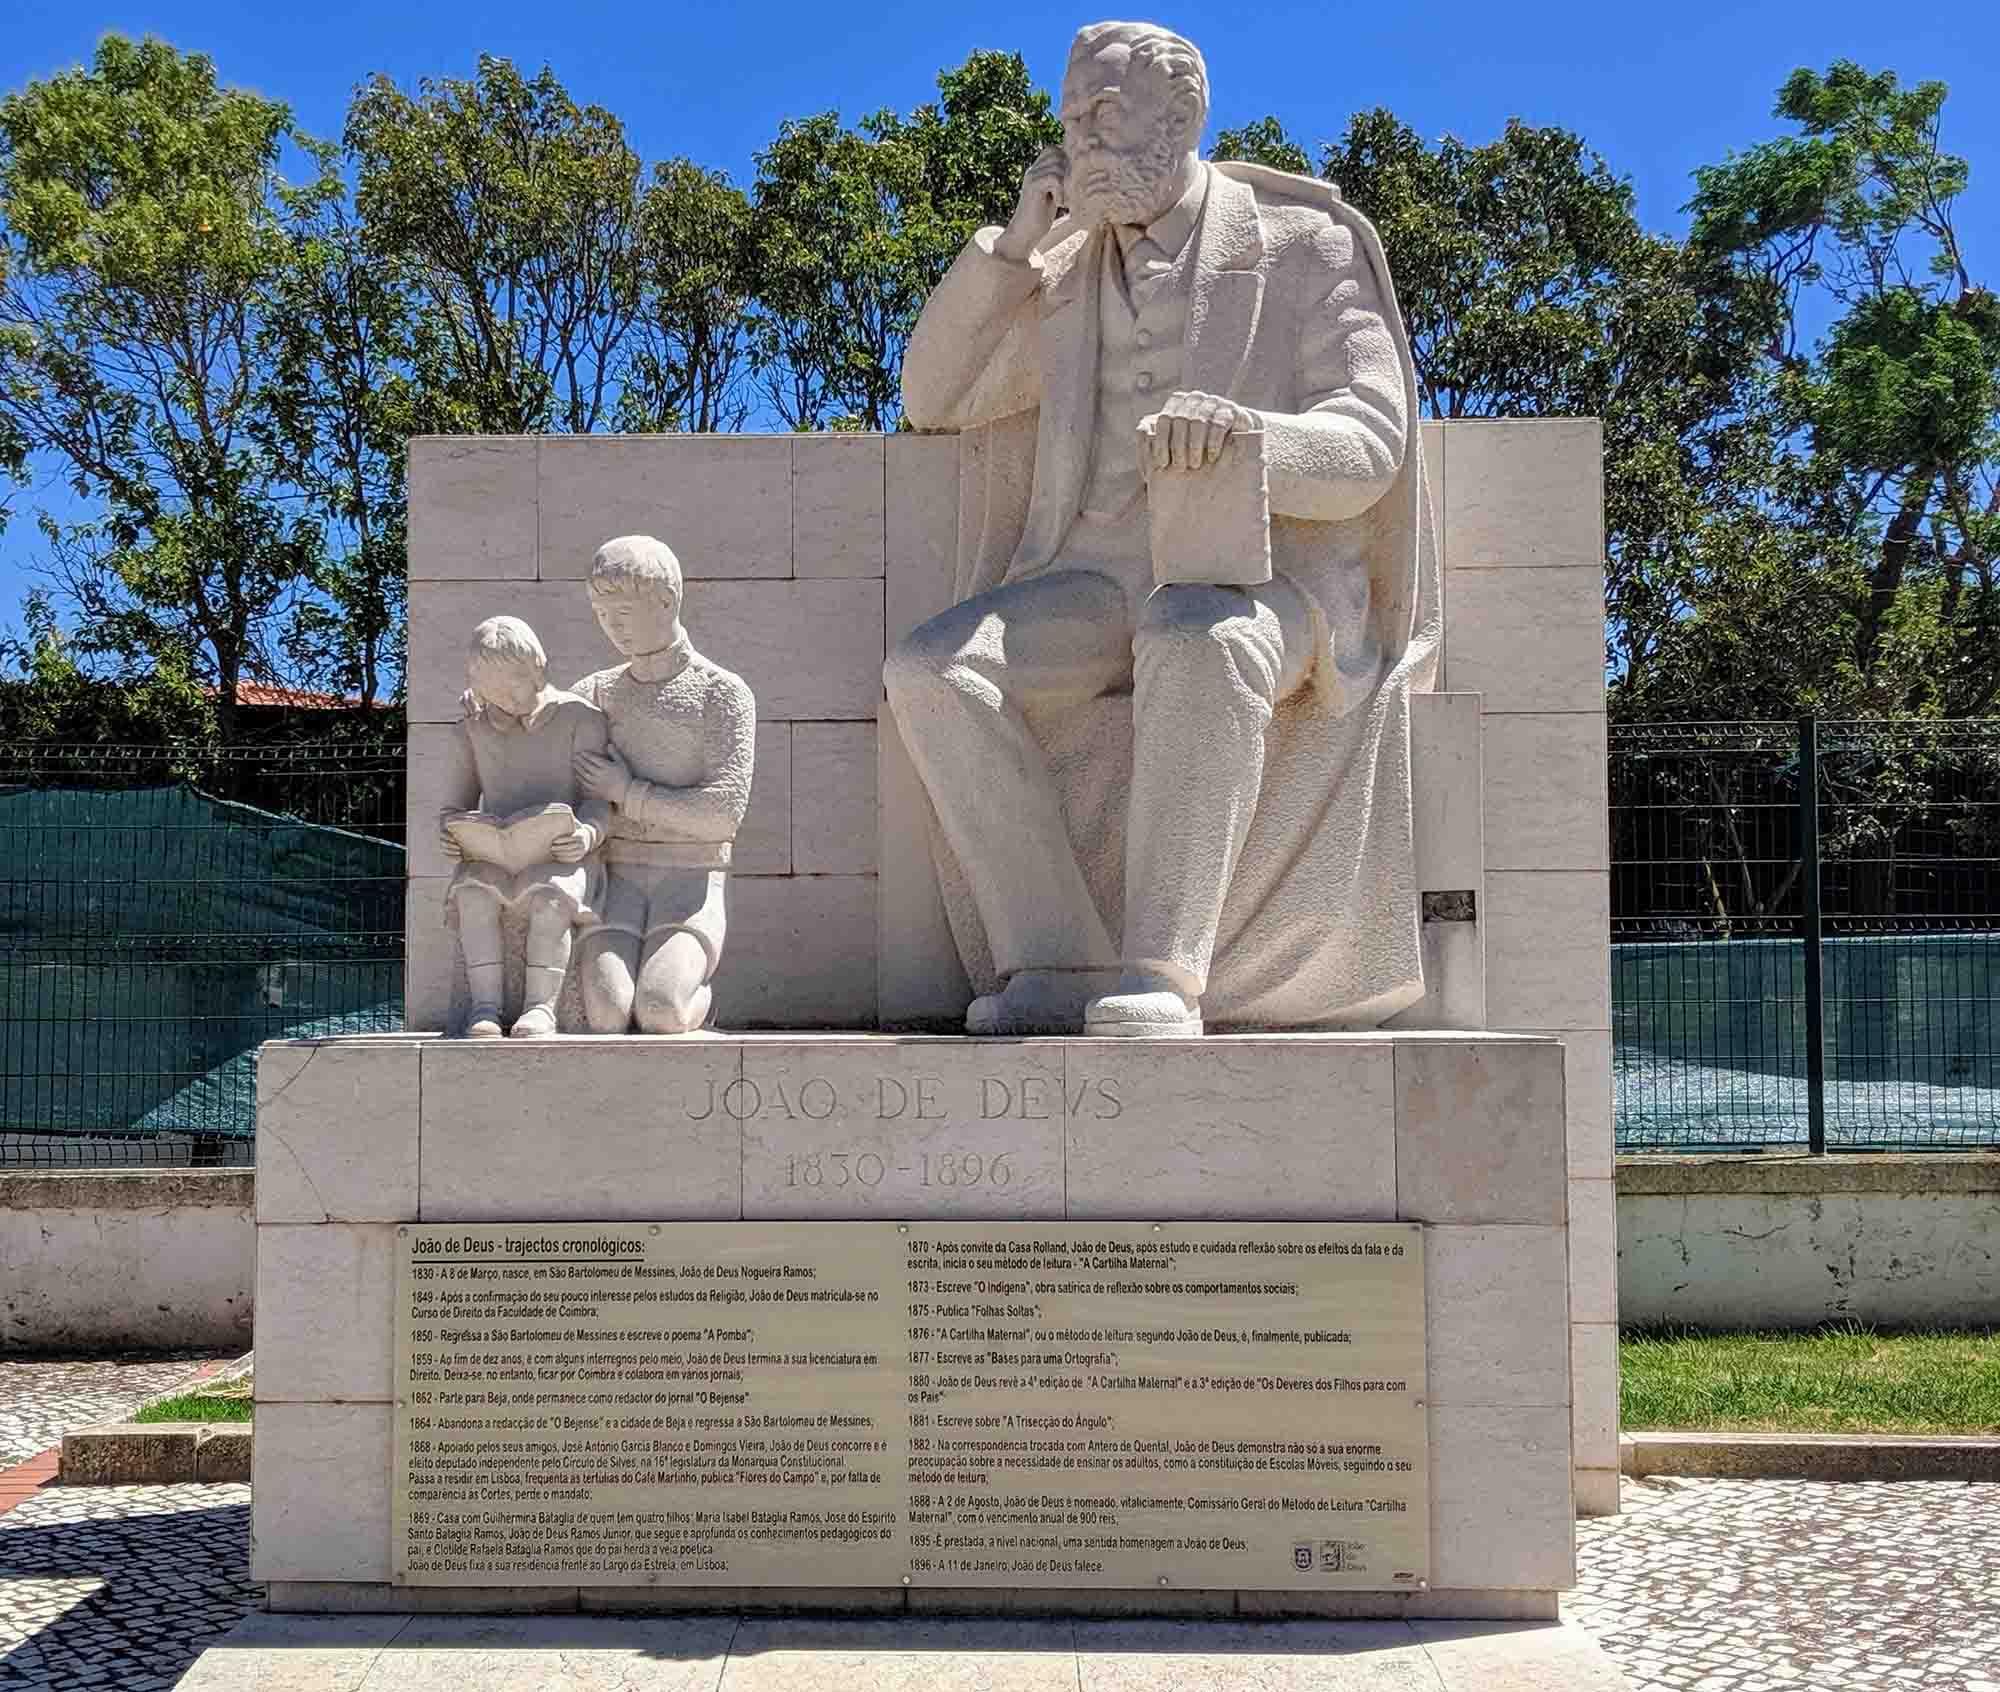 Joao de Deus monument Messines